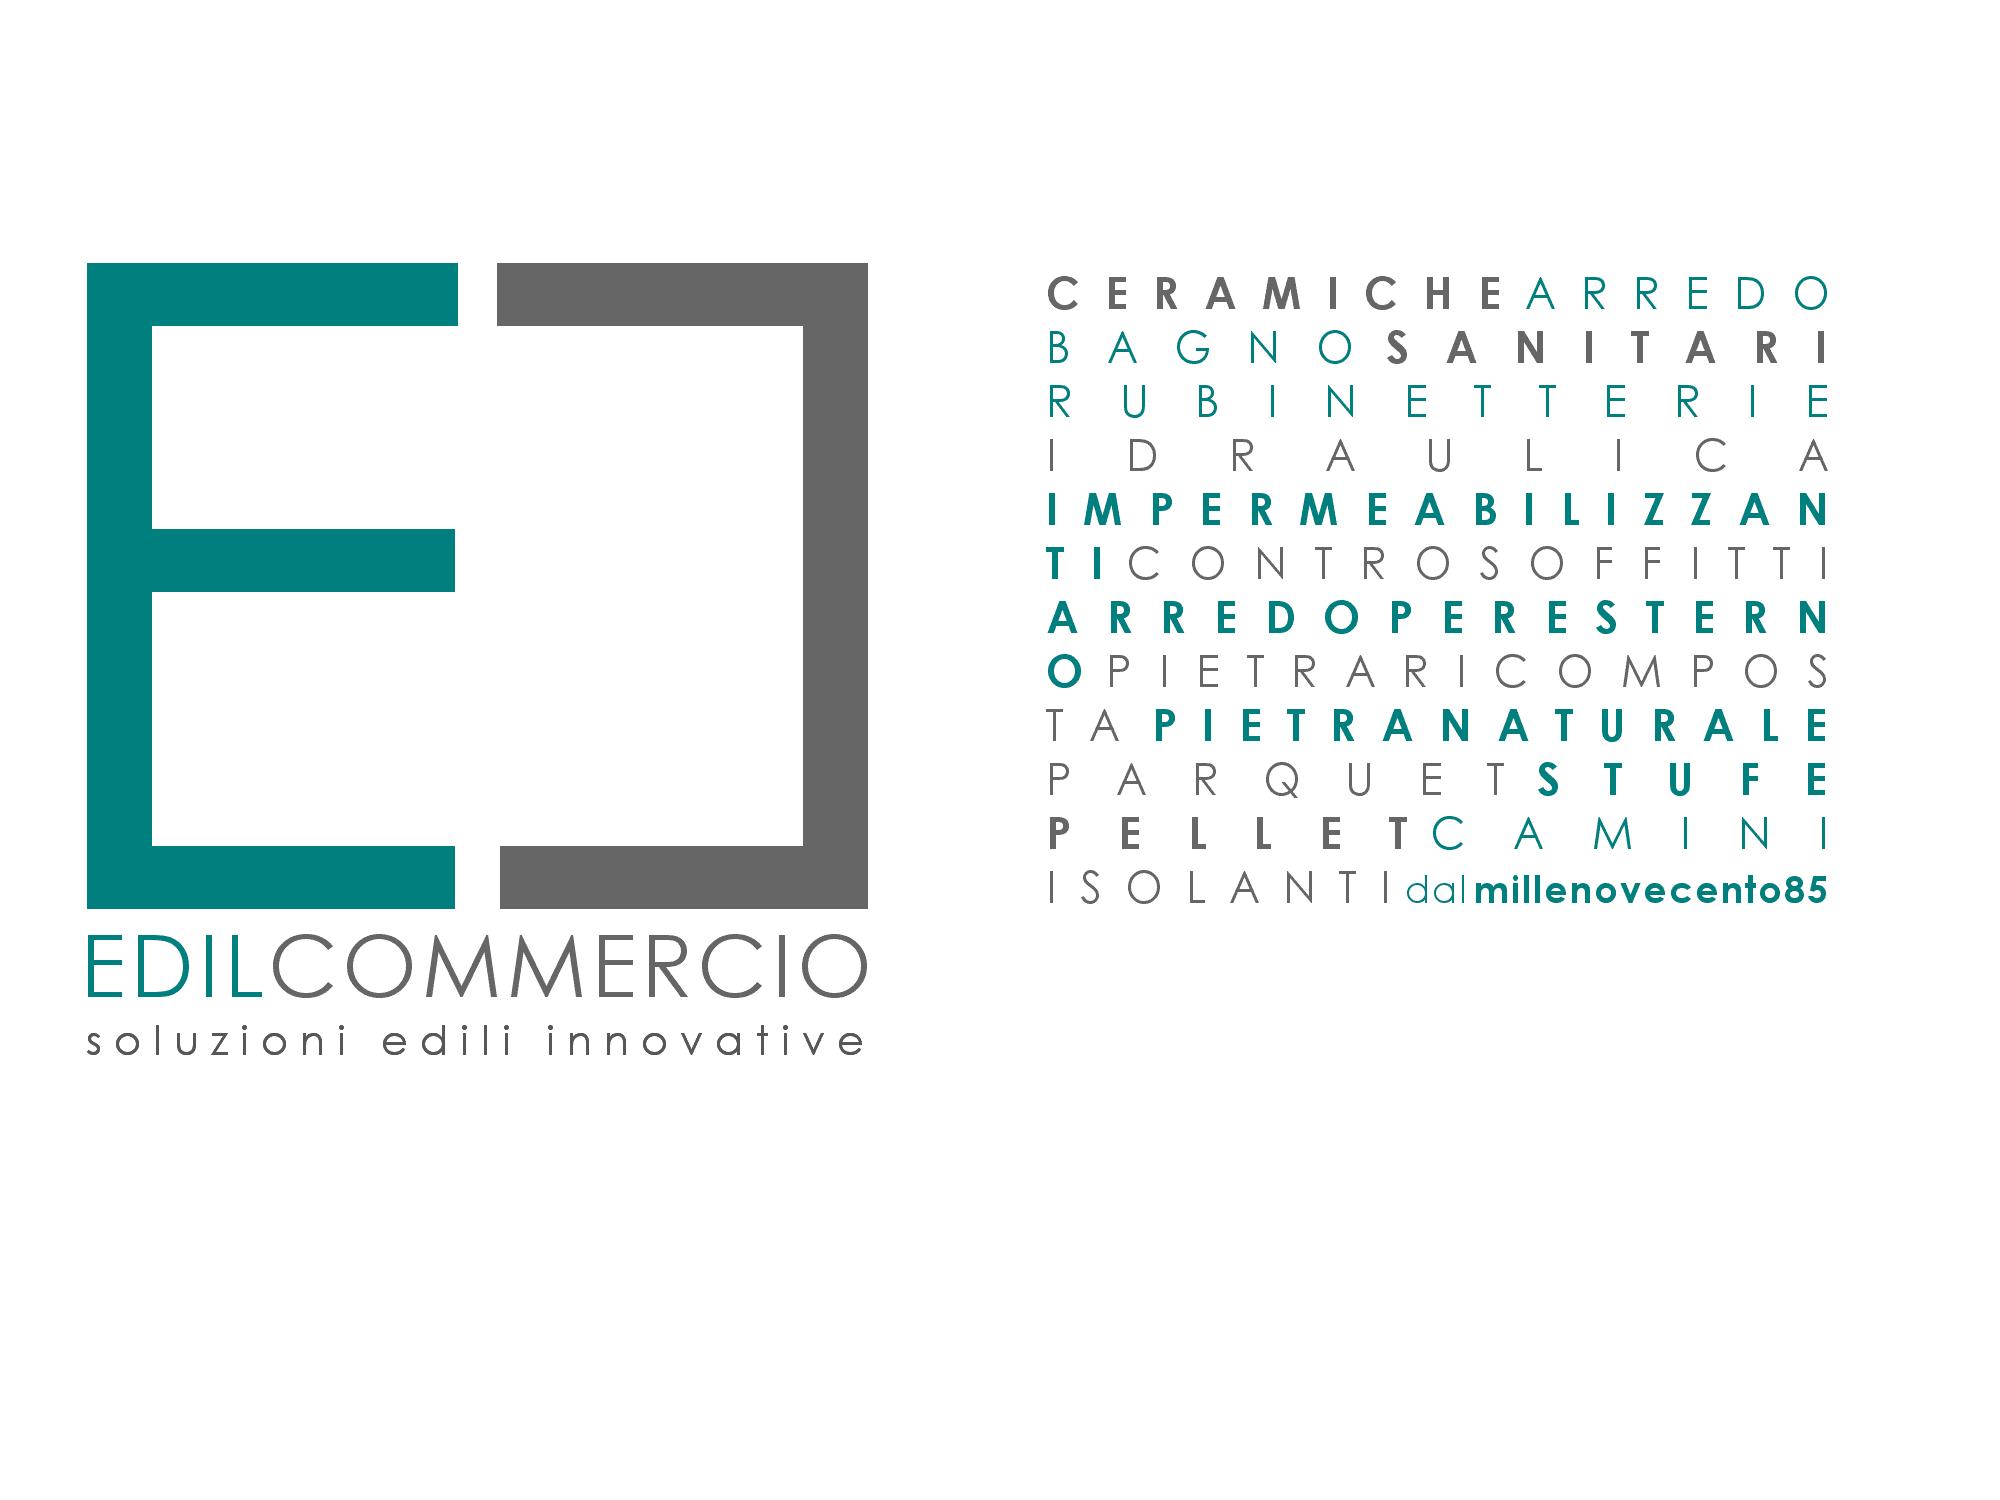 EDIL COMMERCIO - LOGO